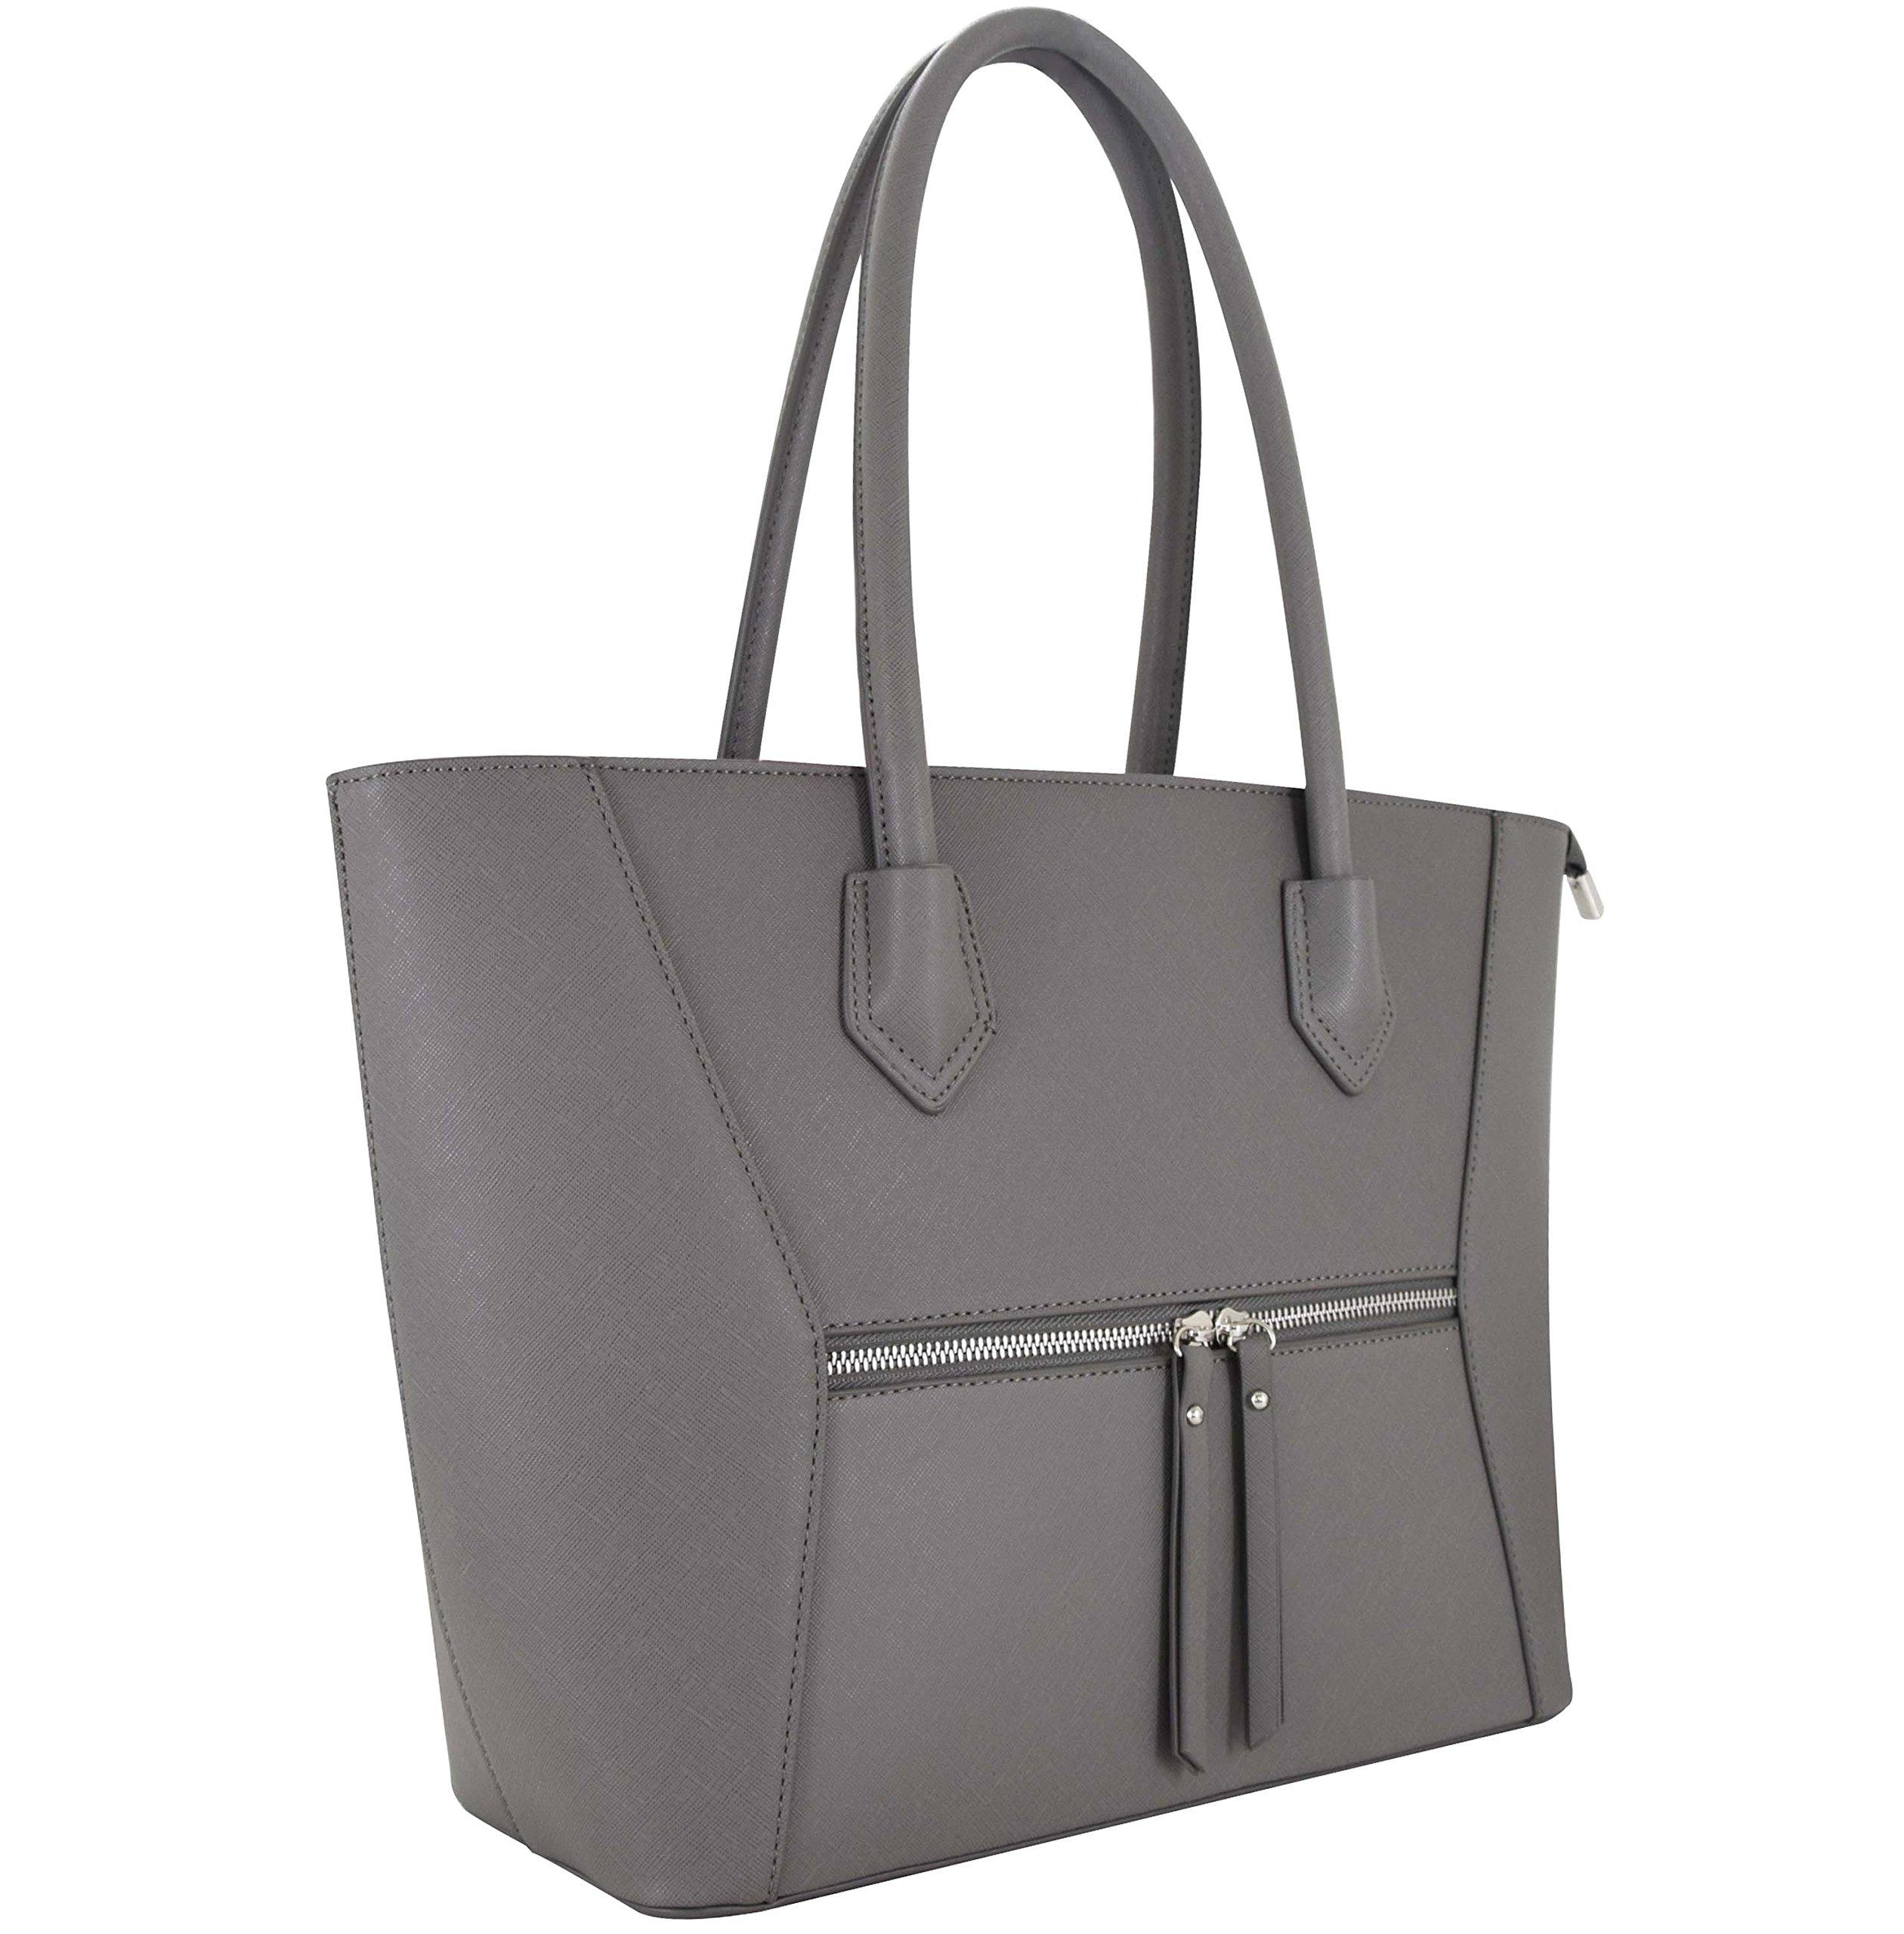 2fd00cdbeab17 Vanessa   Melissa (Farbauswahl) Damen Handtasche Kunstleder TÜV geprüft groß  Schultertasche Shopper A4 Sale